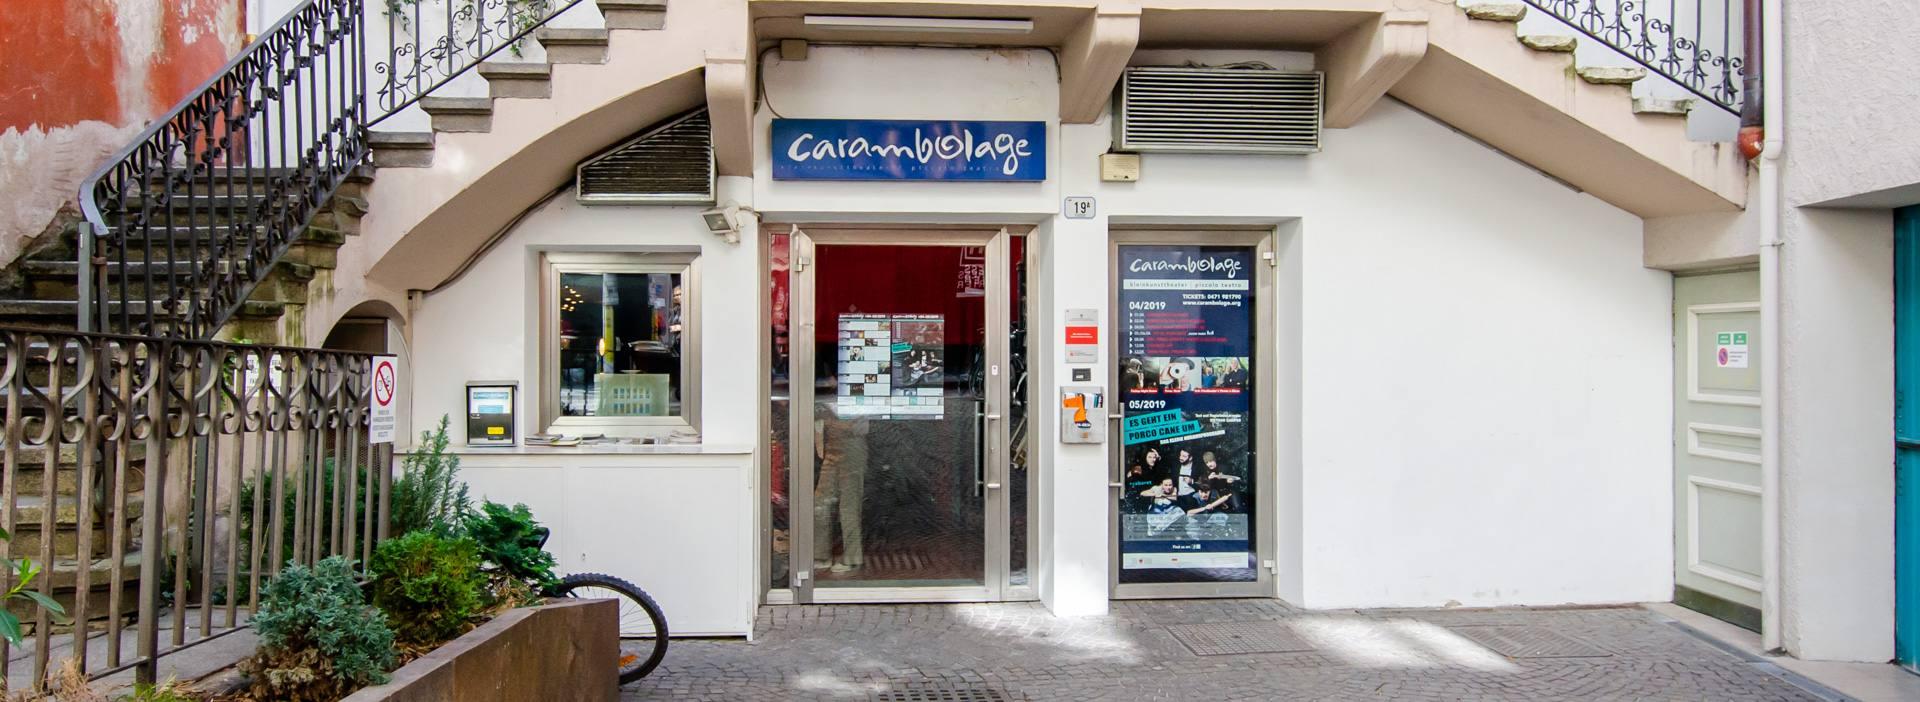 Kleinkunsttheater Carambolage